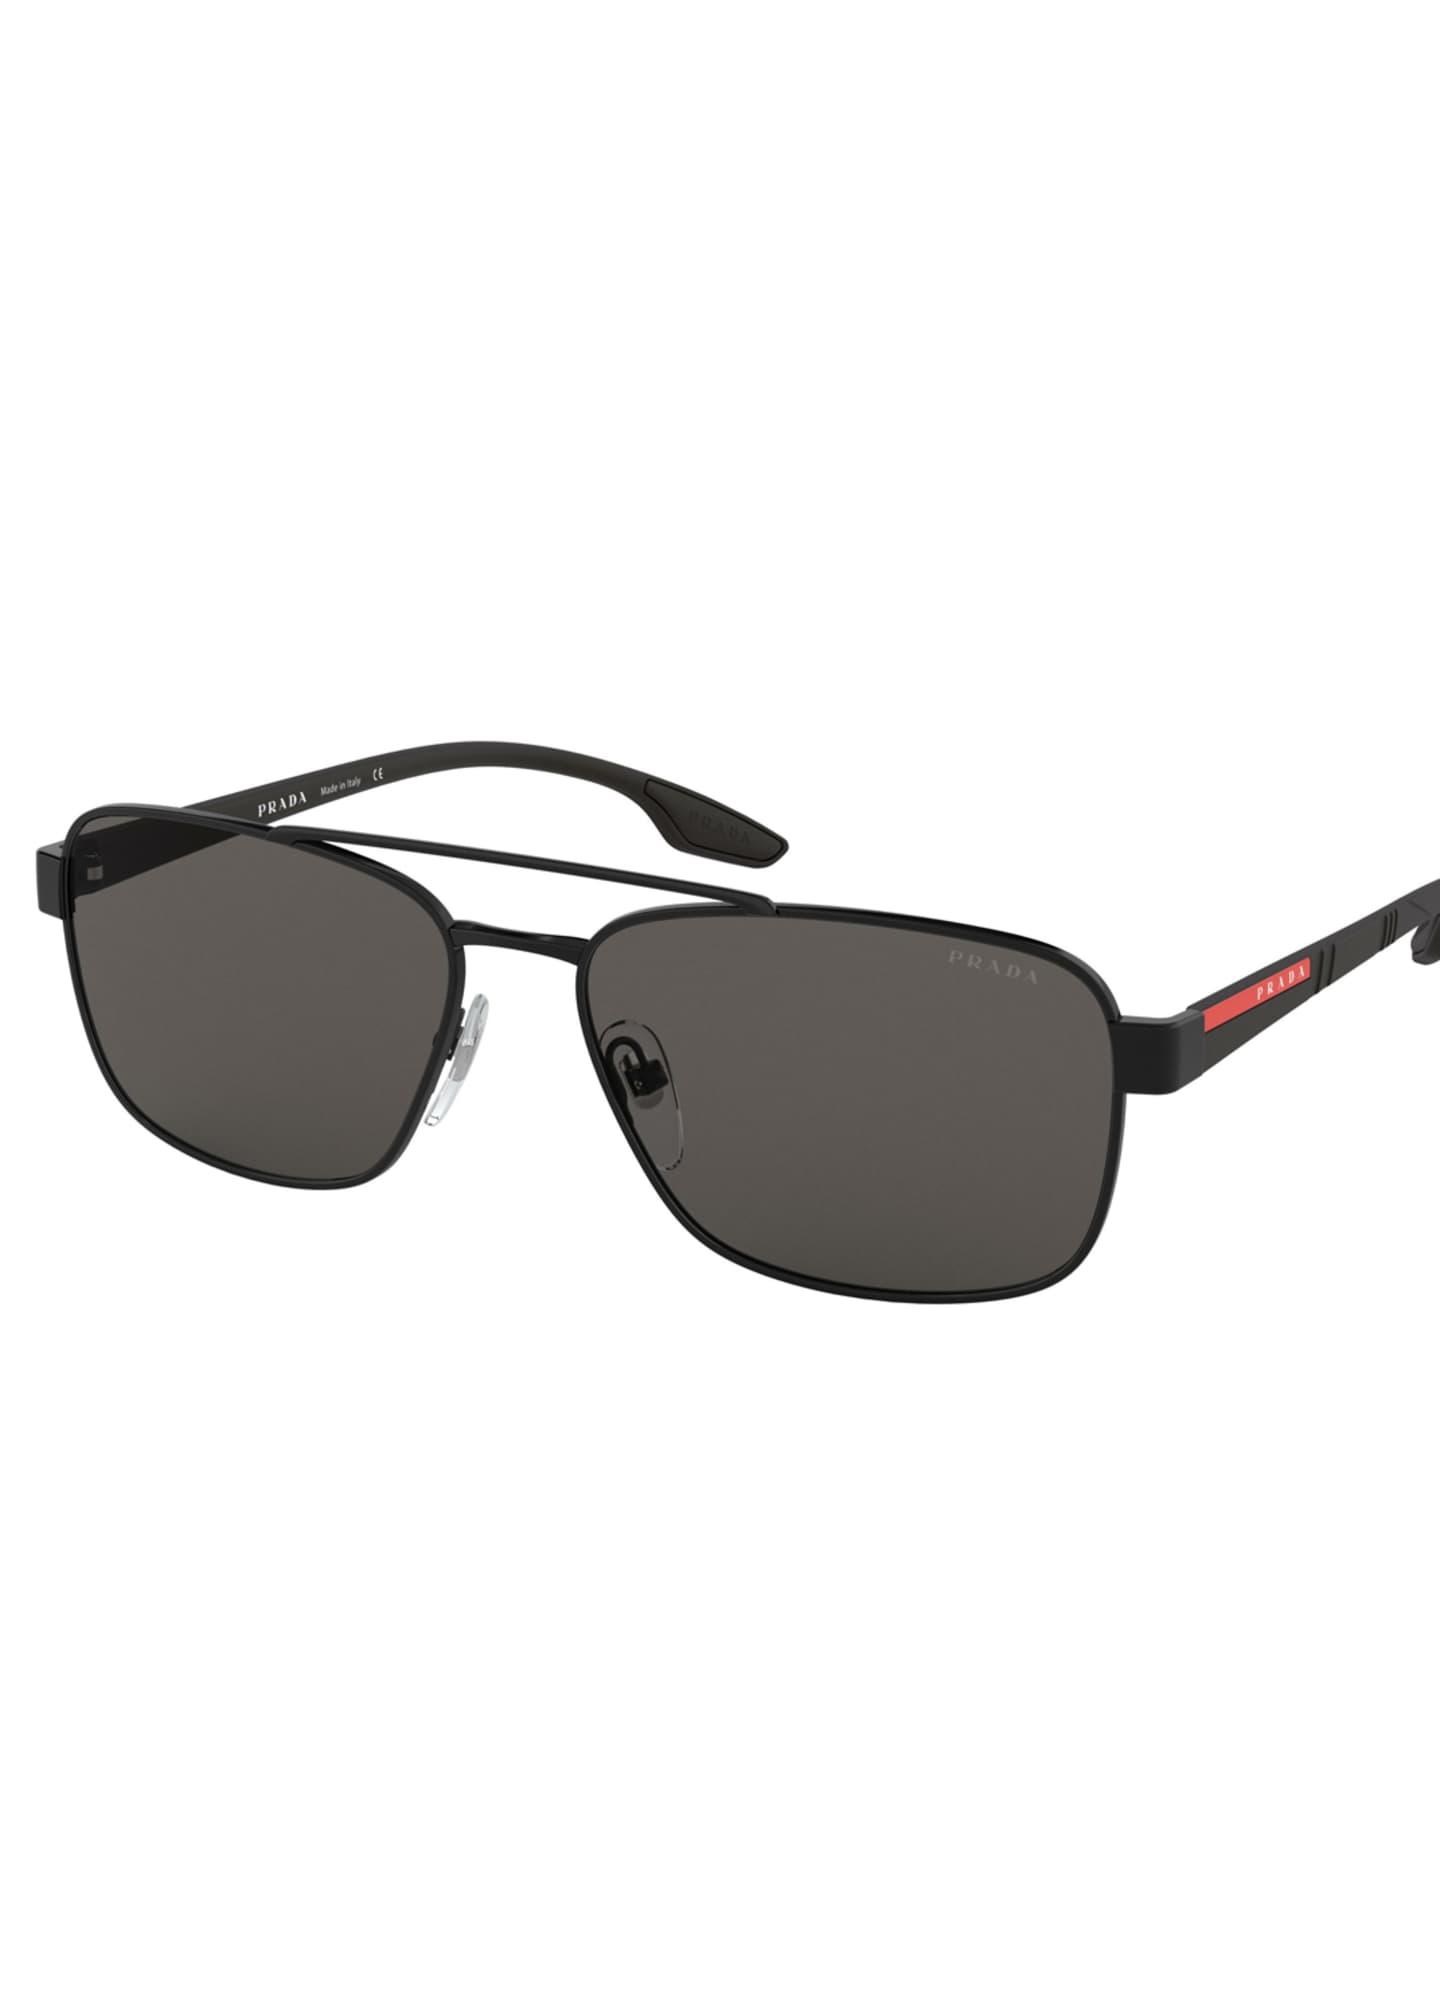 Prada Men's 59mm Square Metal Aviator Sunglasses